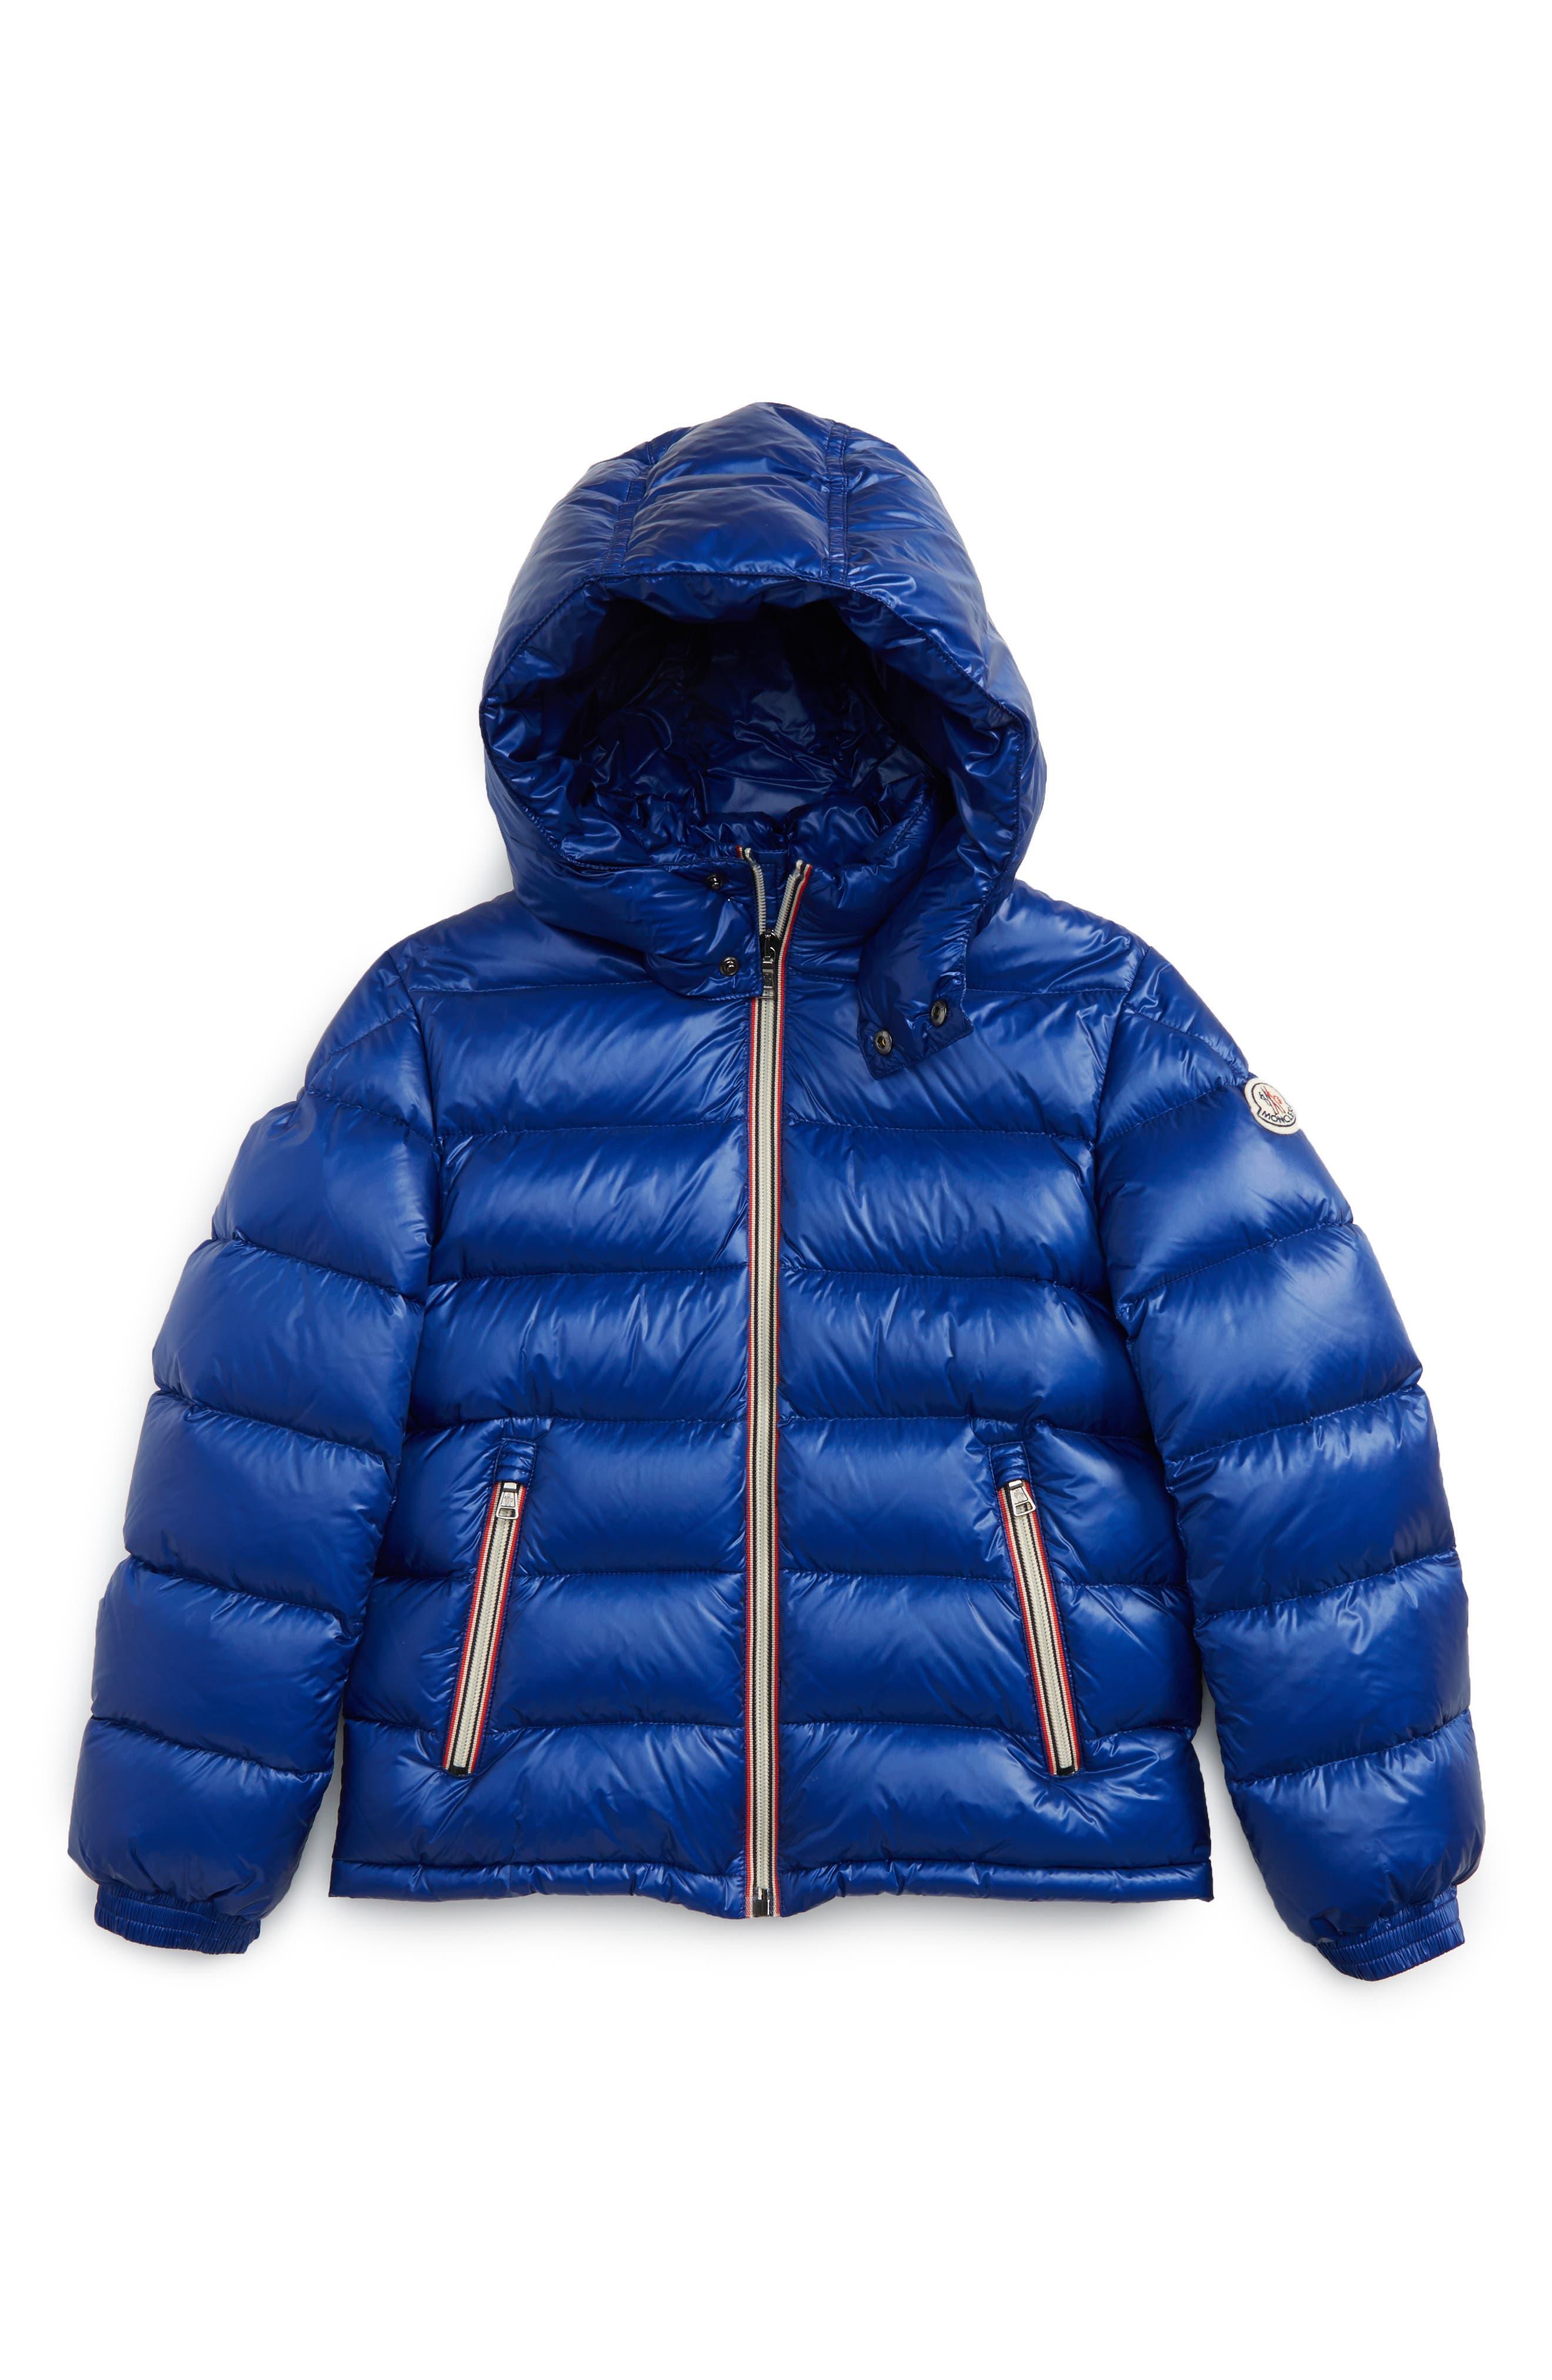 Alternate Image 1 Selected - Moncler New Gaston Hooded Water Resistant Down Jacket (Toddler Boys, Little Boys & Big Boys)